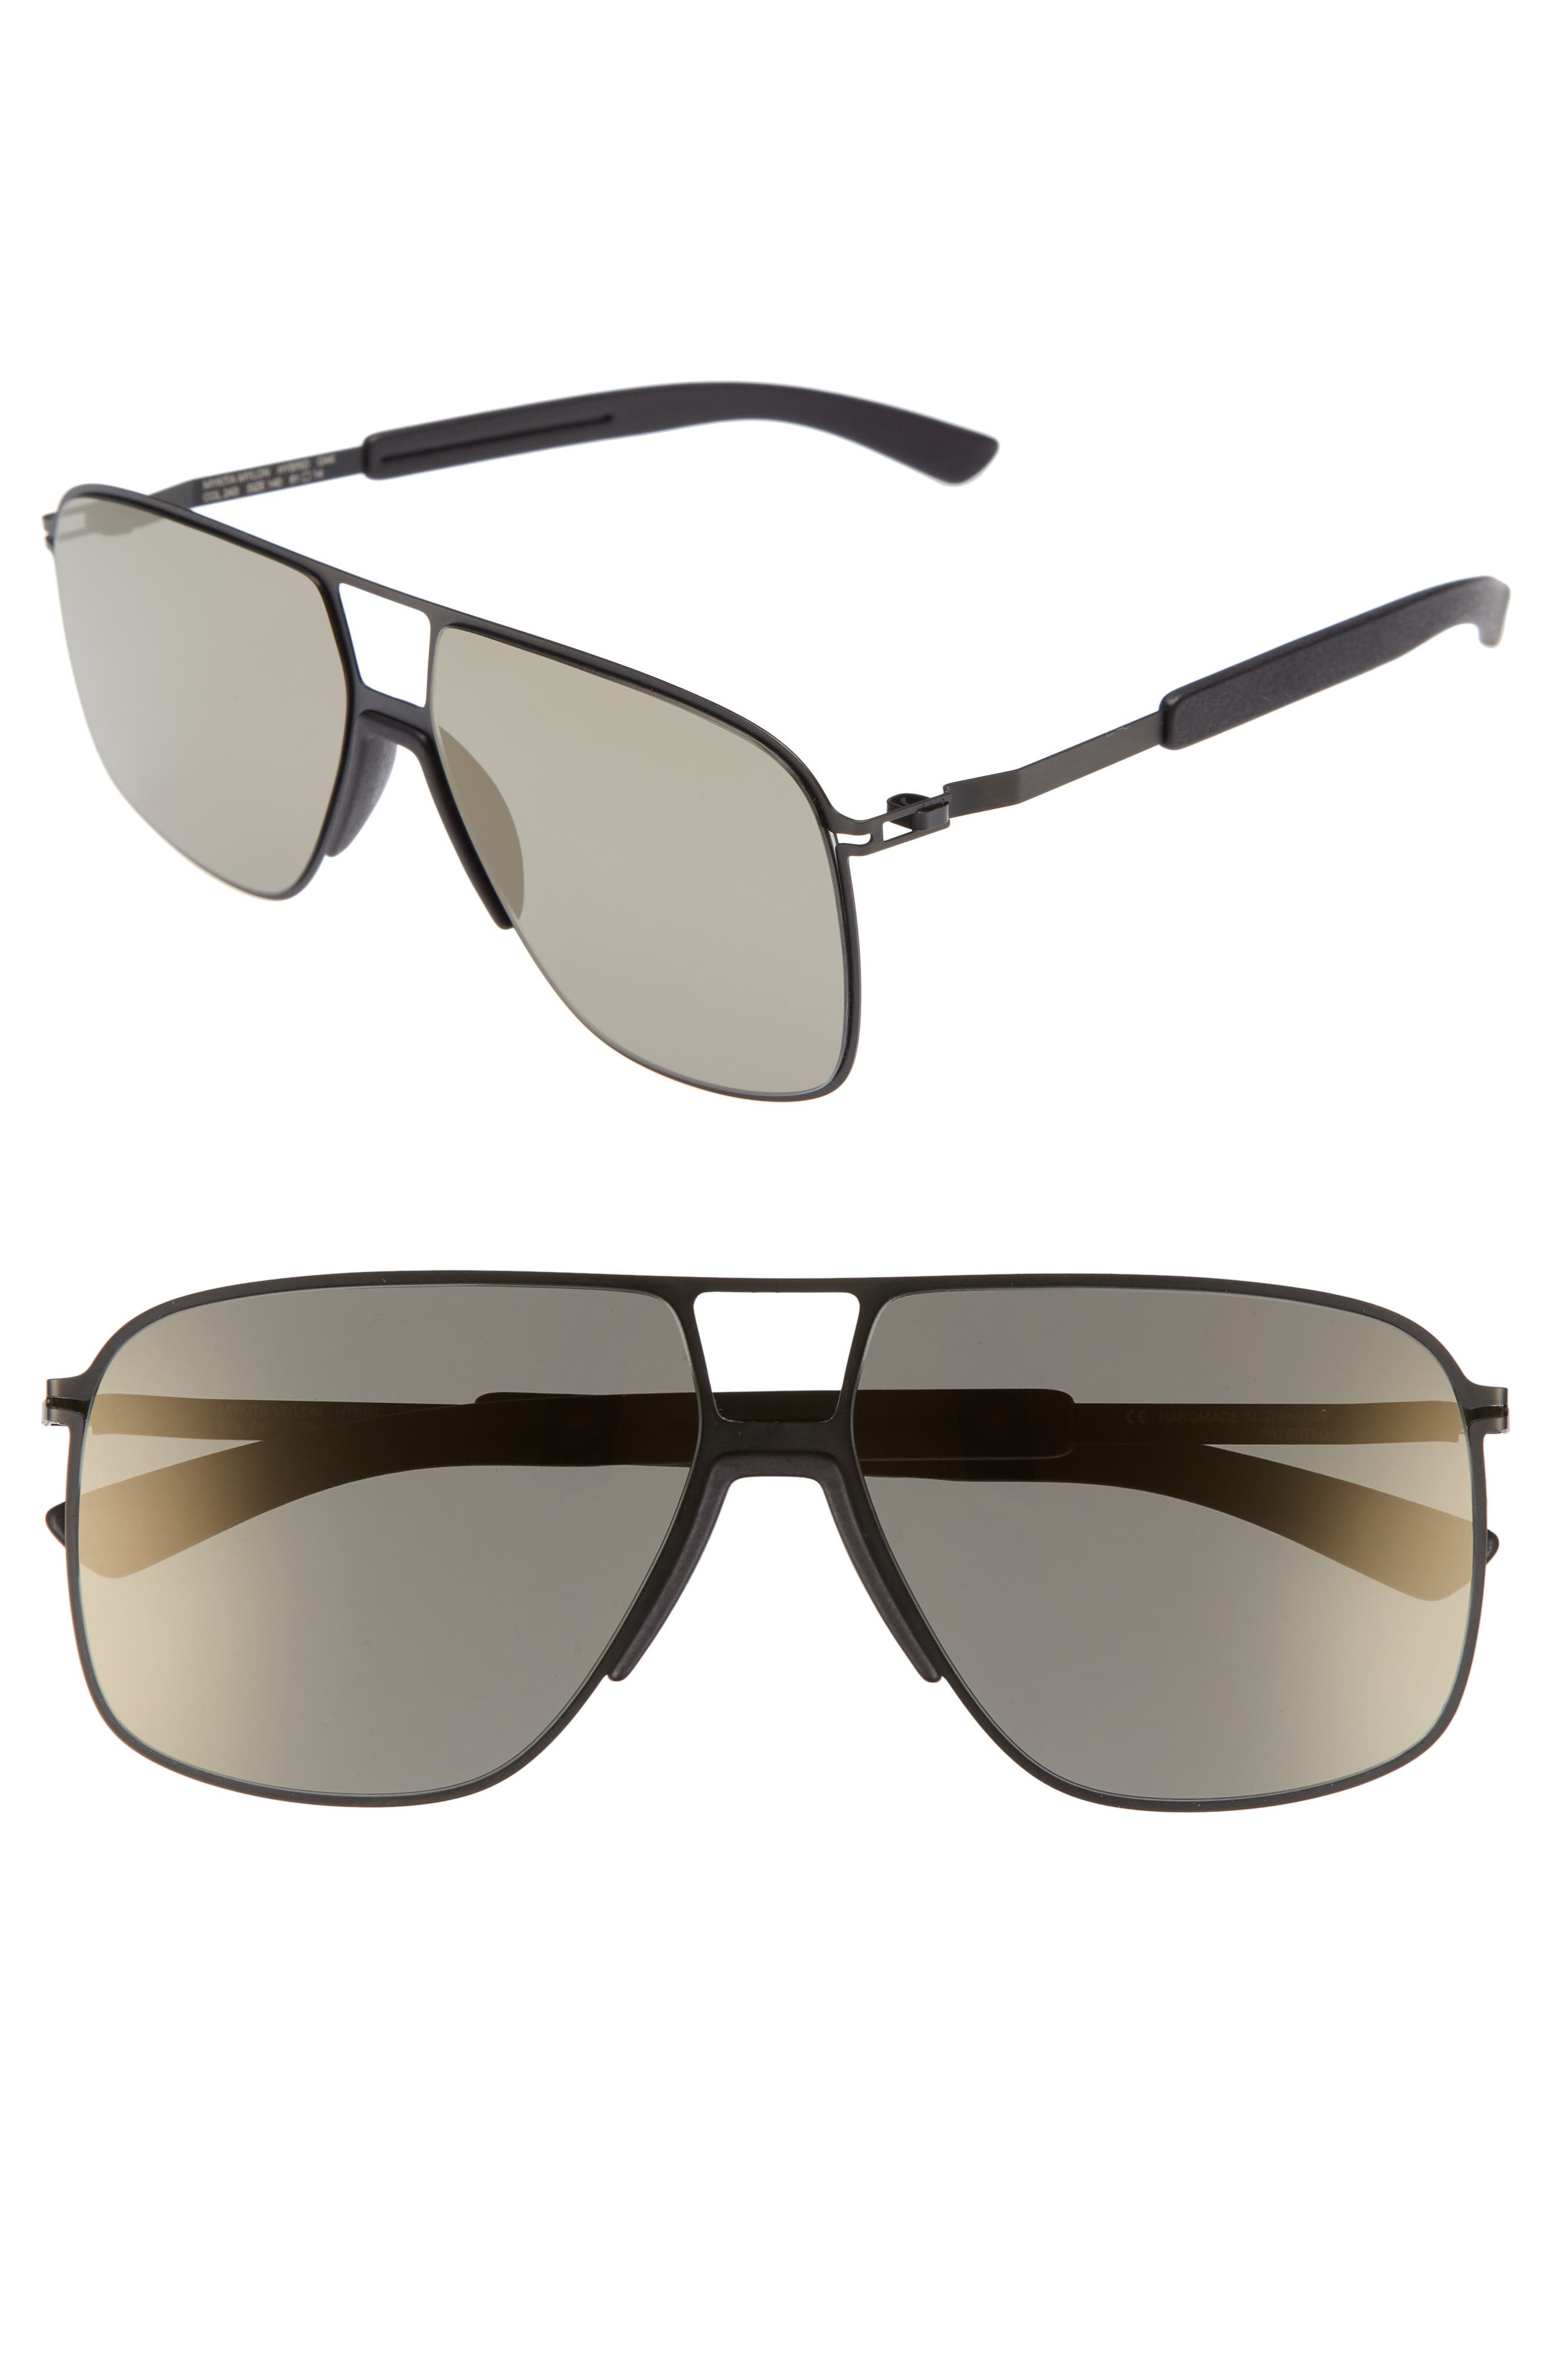 Oak 61mm Aviator Sunglasses,                             Main thumbnail 1, color,                             001